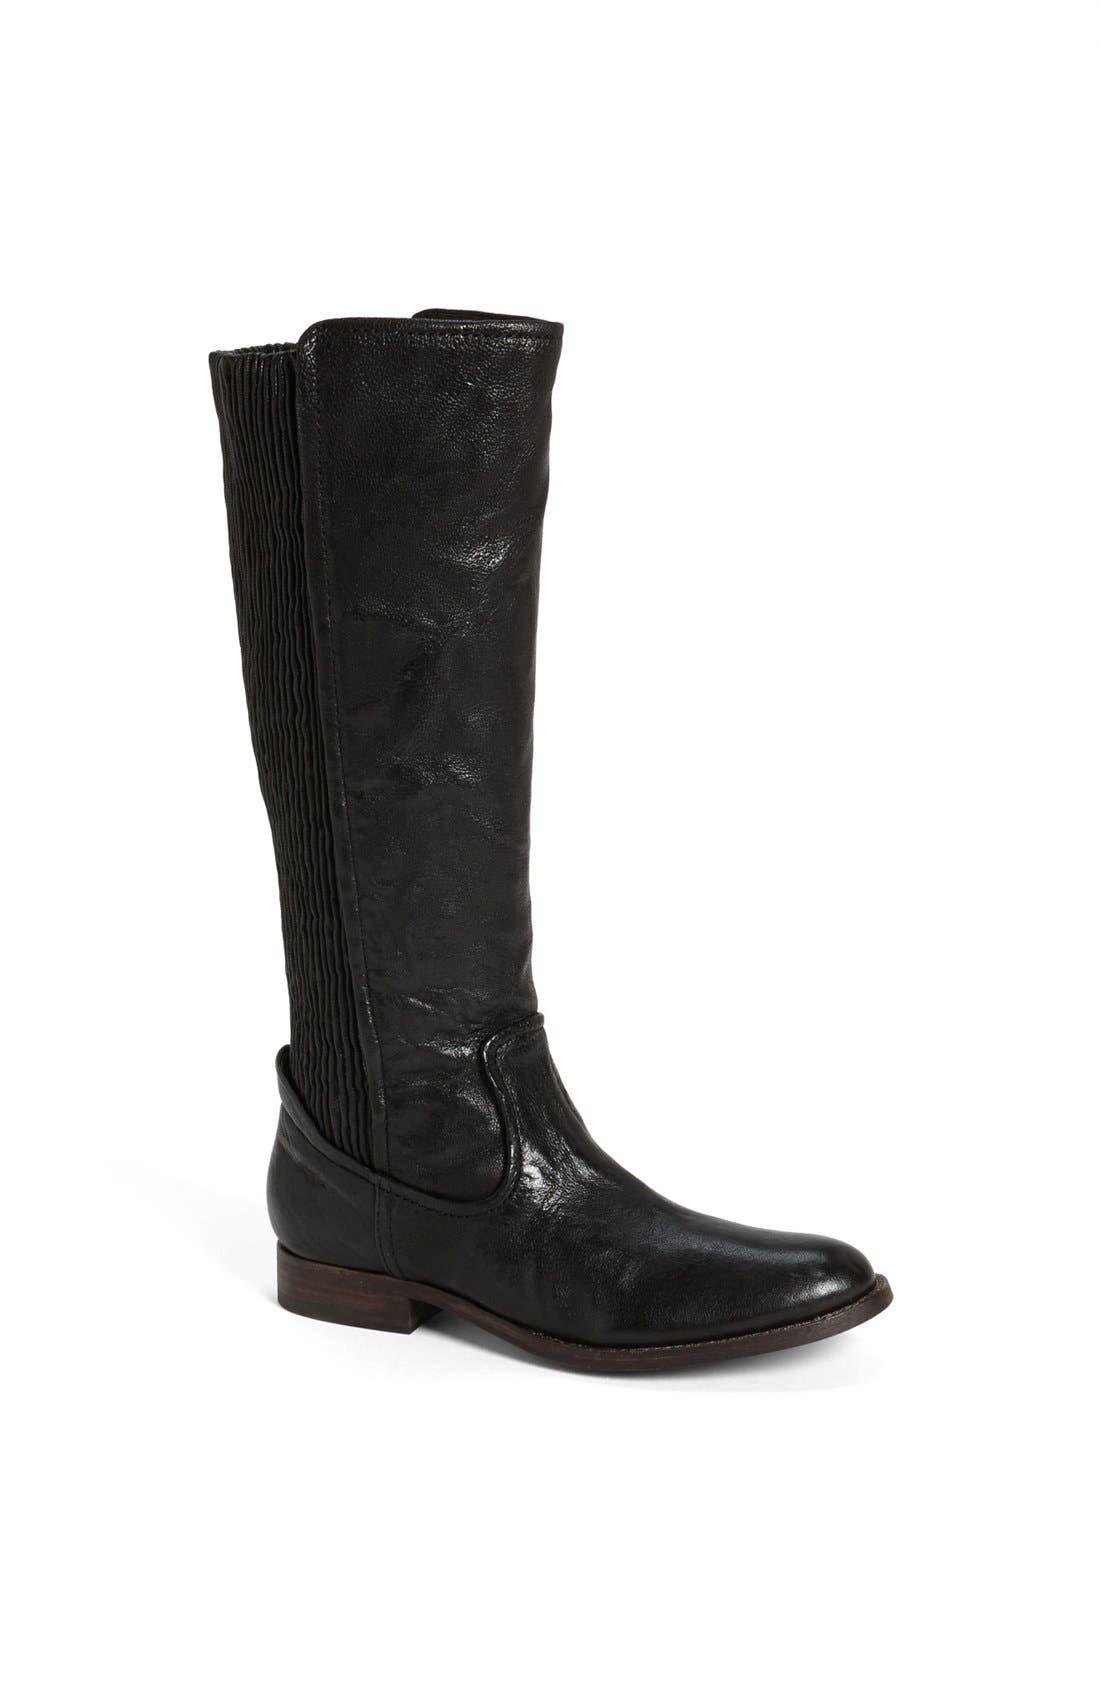 FRYE 'Melissa Scrunch' Boot, Main, color, 001